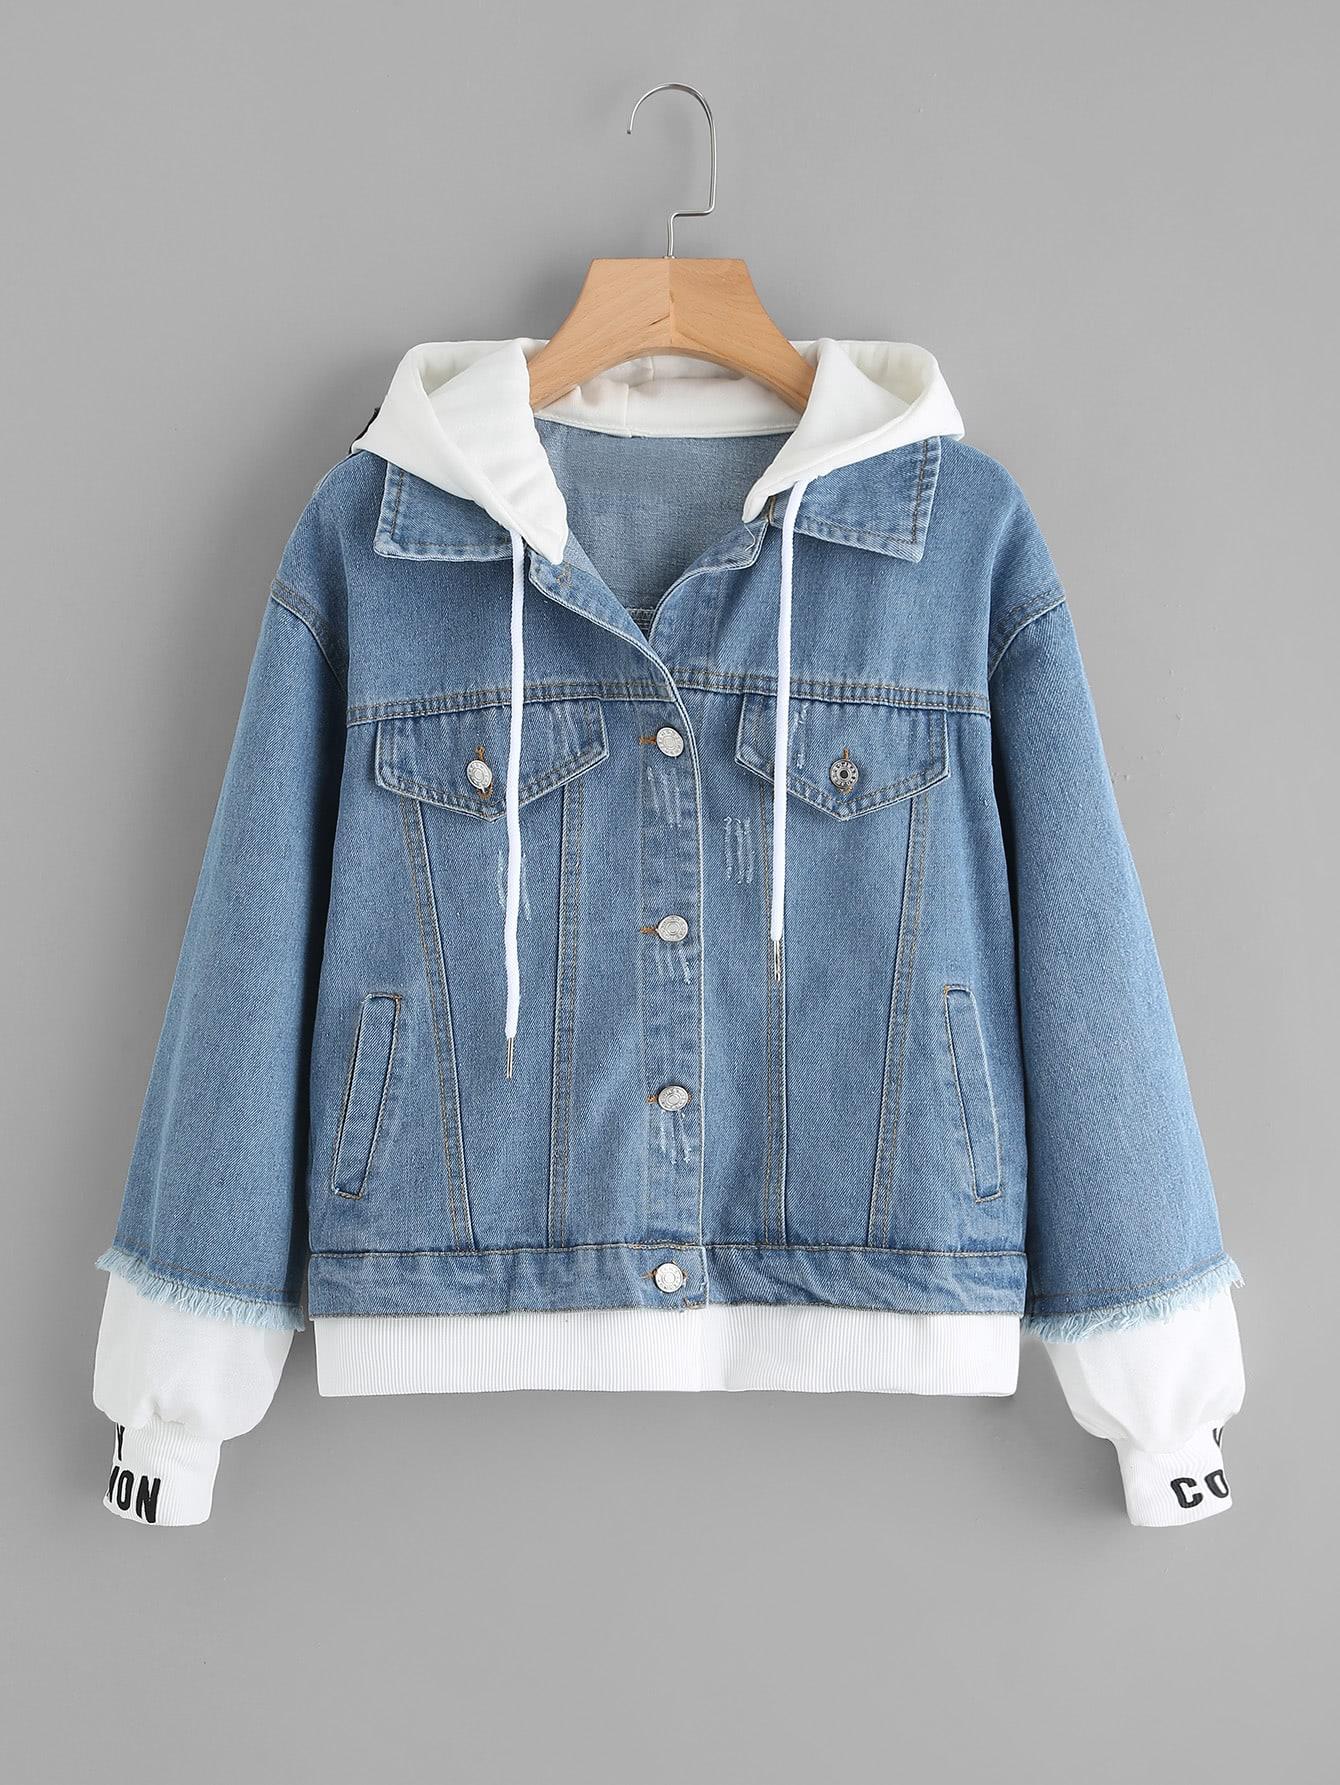 2 In 1 Ribbed Knit Trim Hooded Denim Jacket jacket171013131